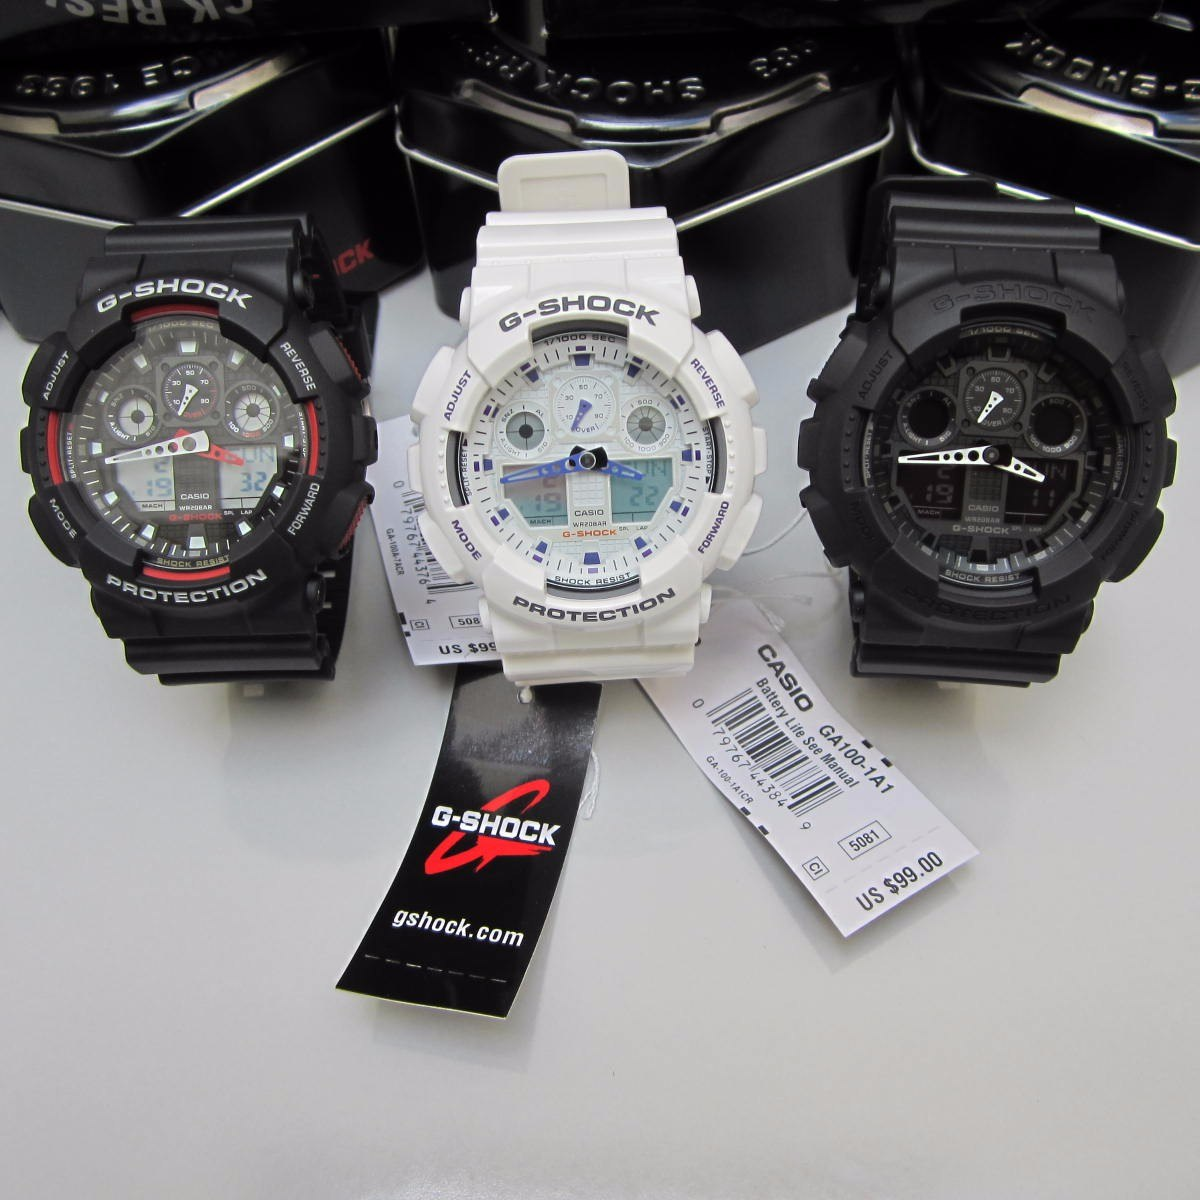 Ga100Originales Shock Casio G Casio Ga100Originales Reloj Casio G G Reloj Reloj Shock q3cAR54jL